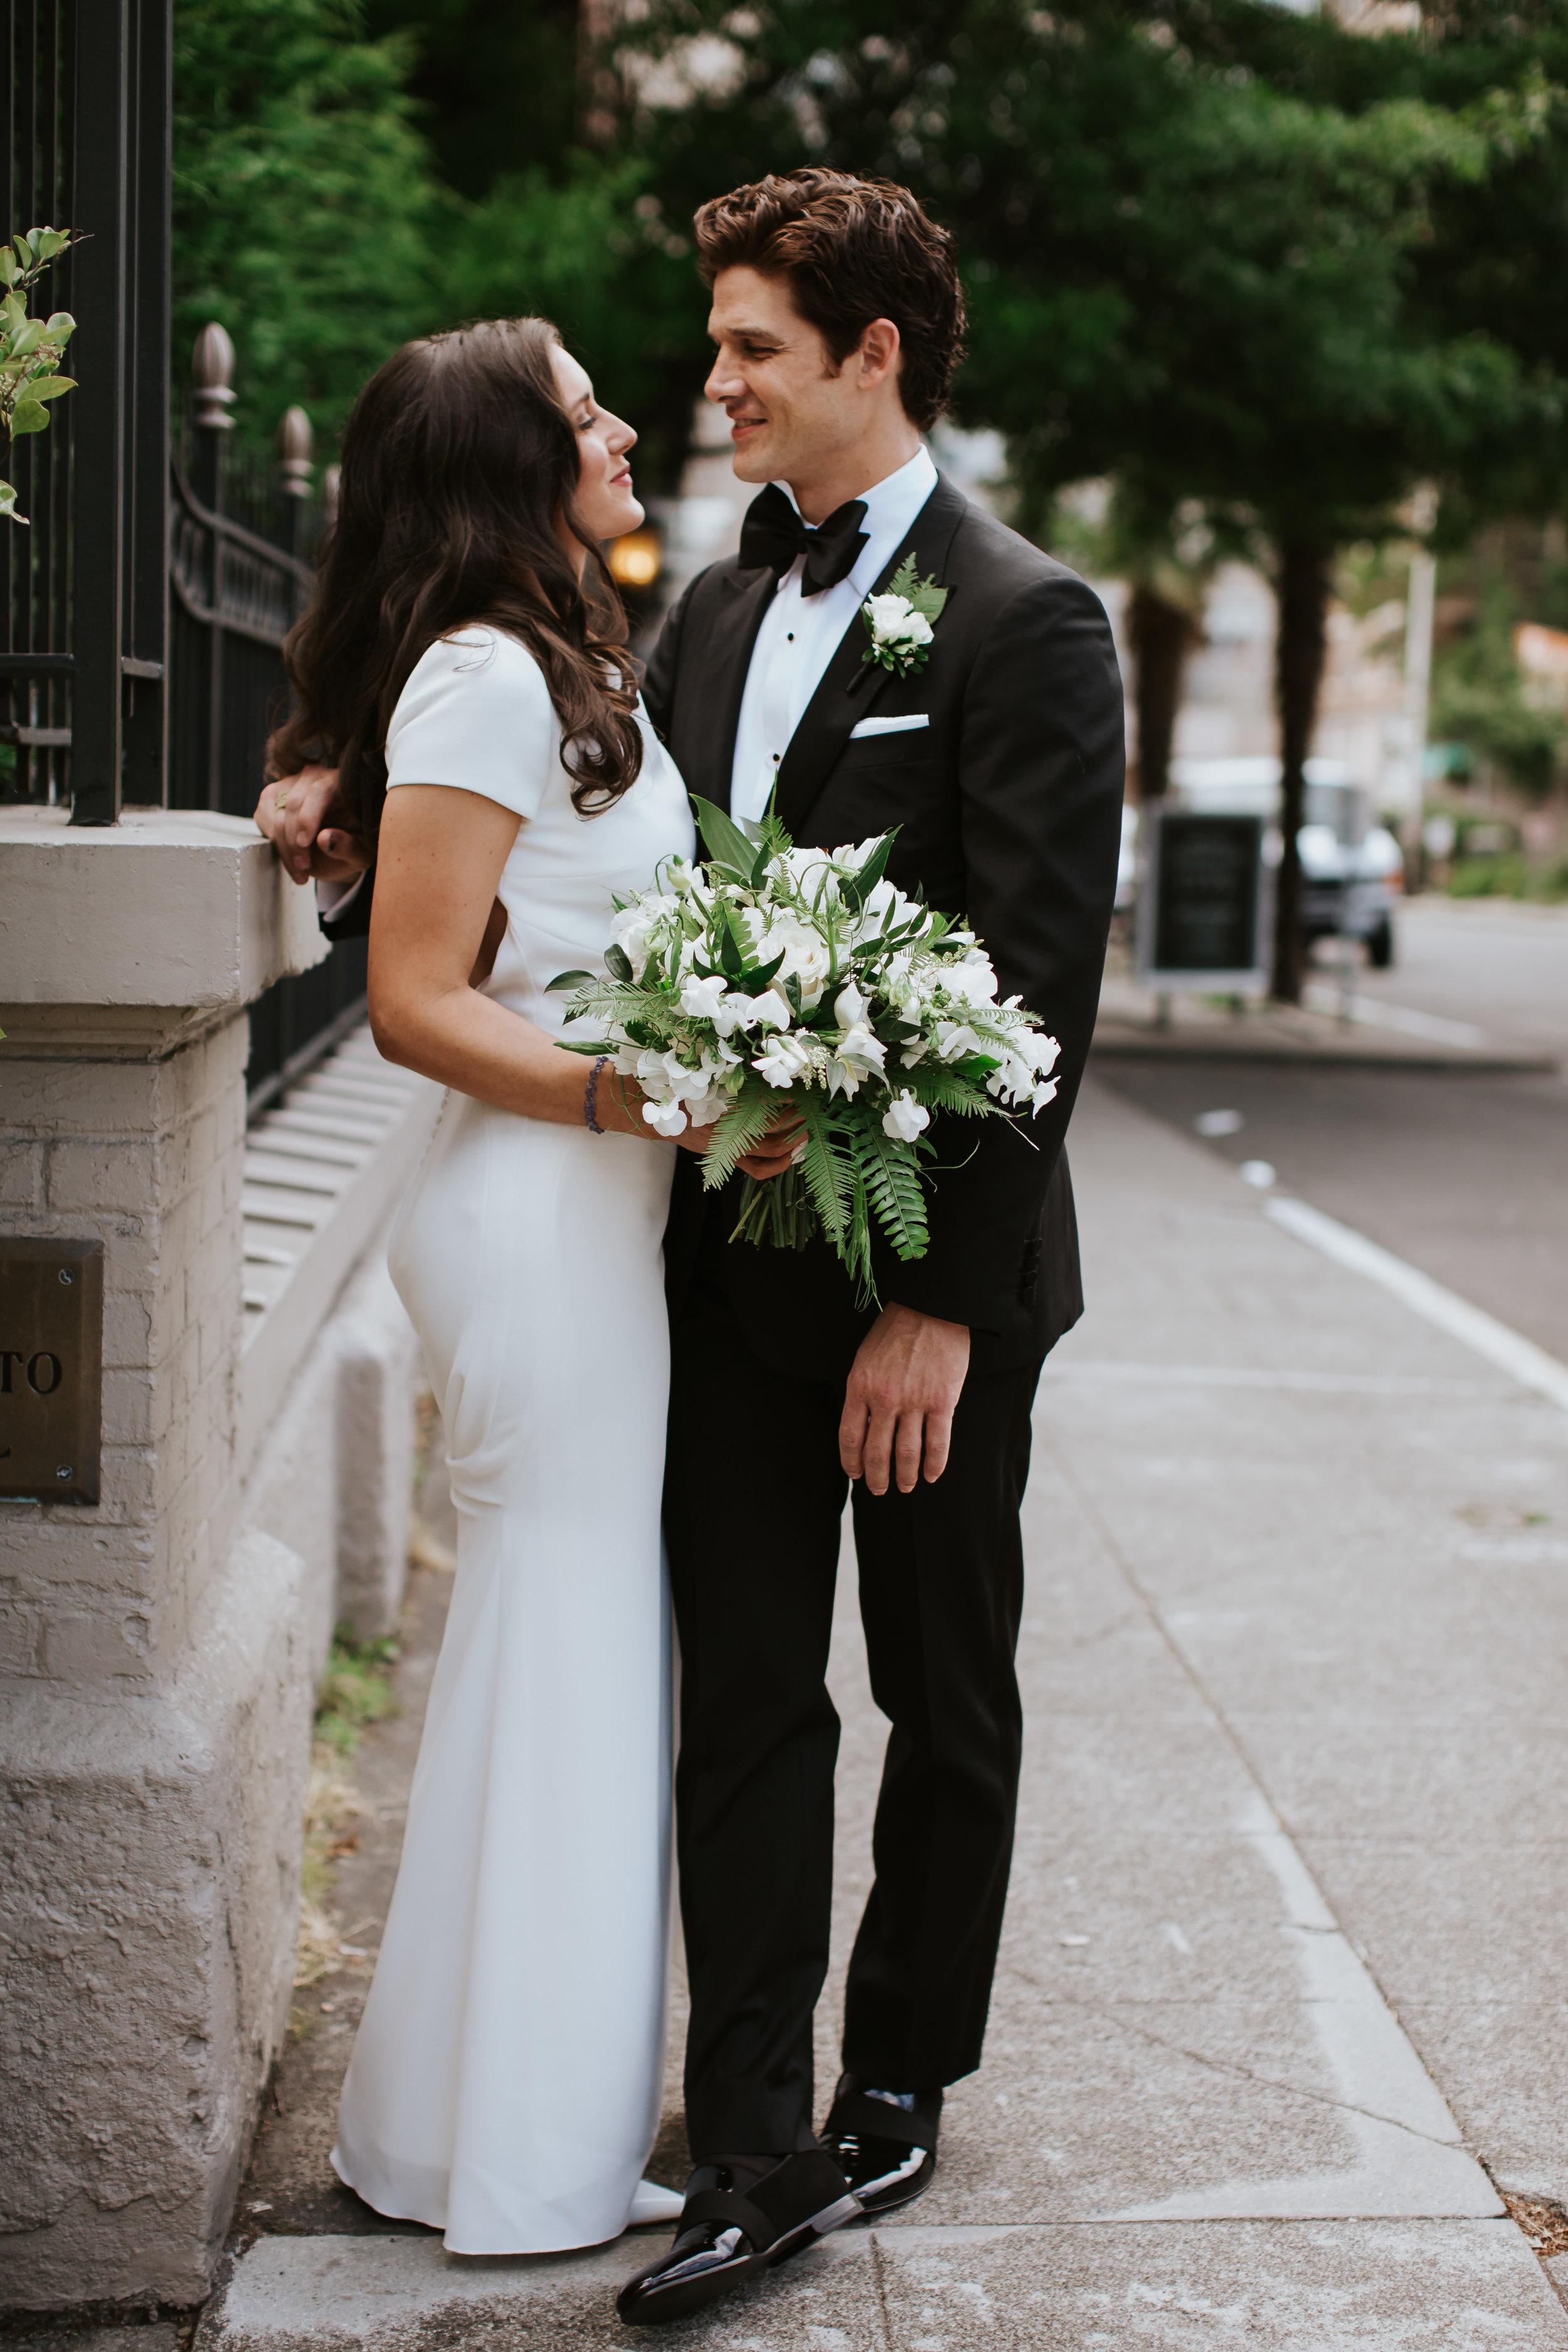 MaryattPhotography_OS_wedding-2-19.jpg